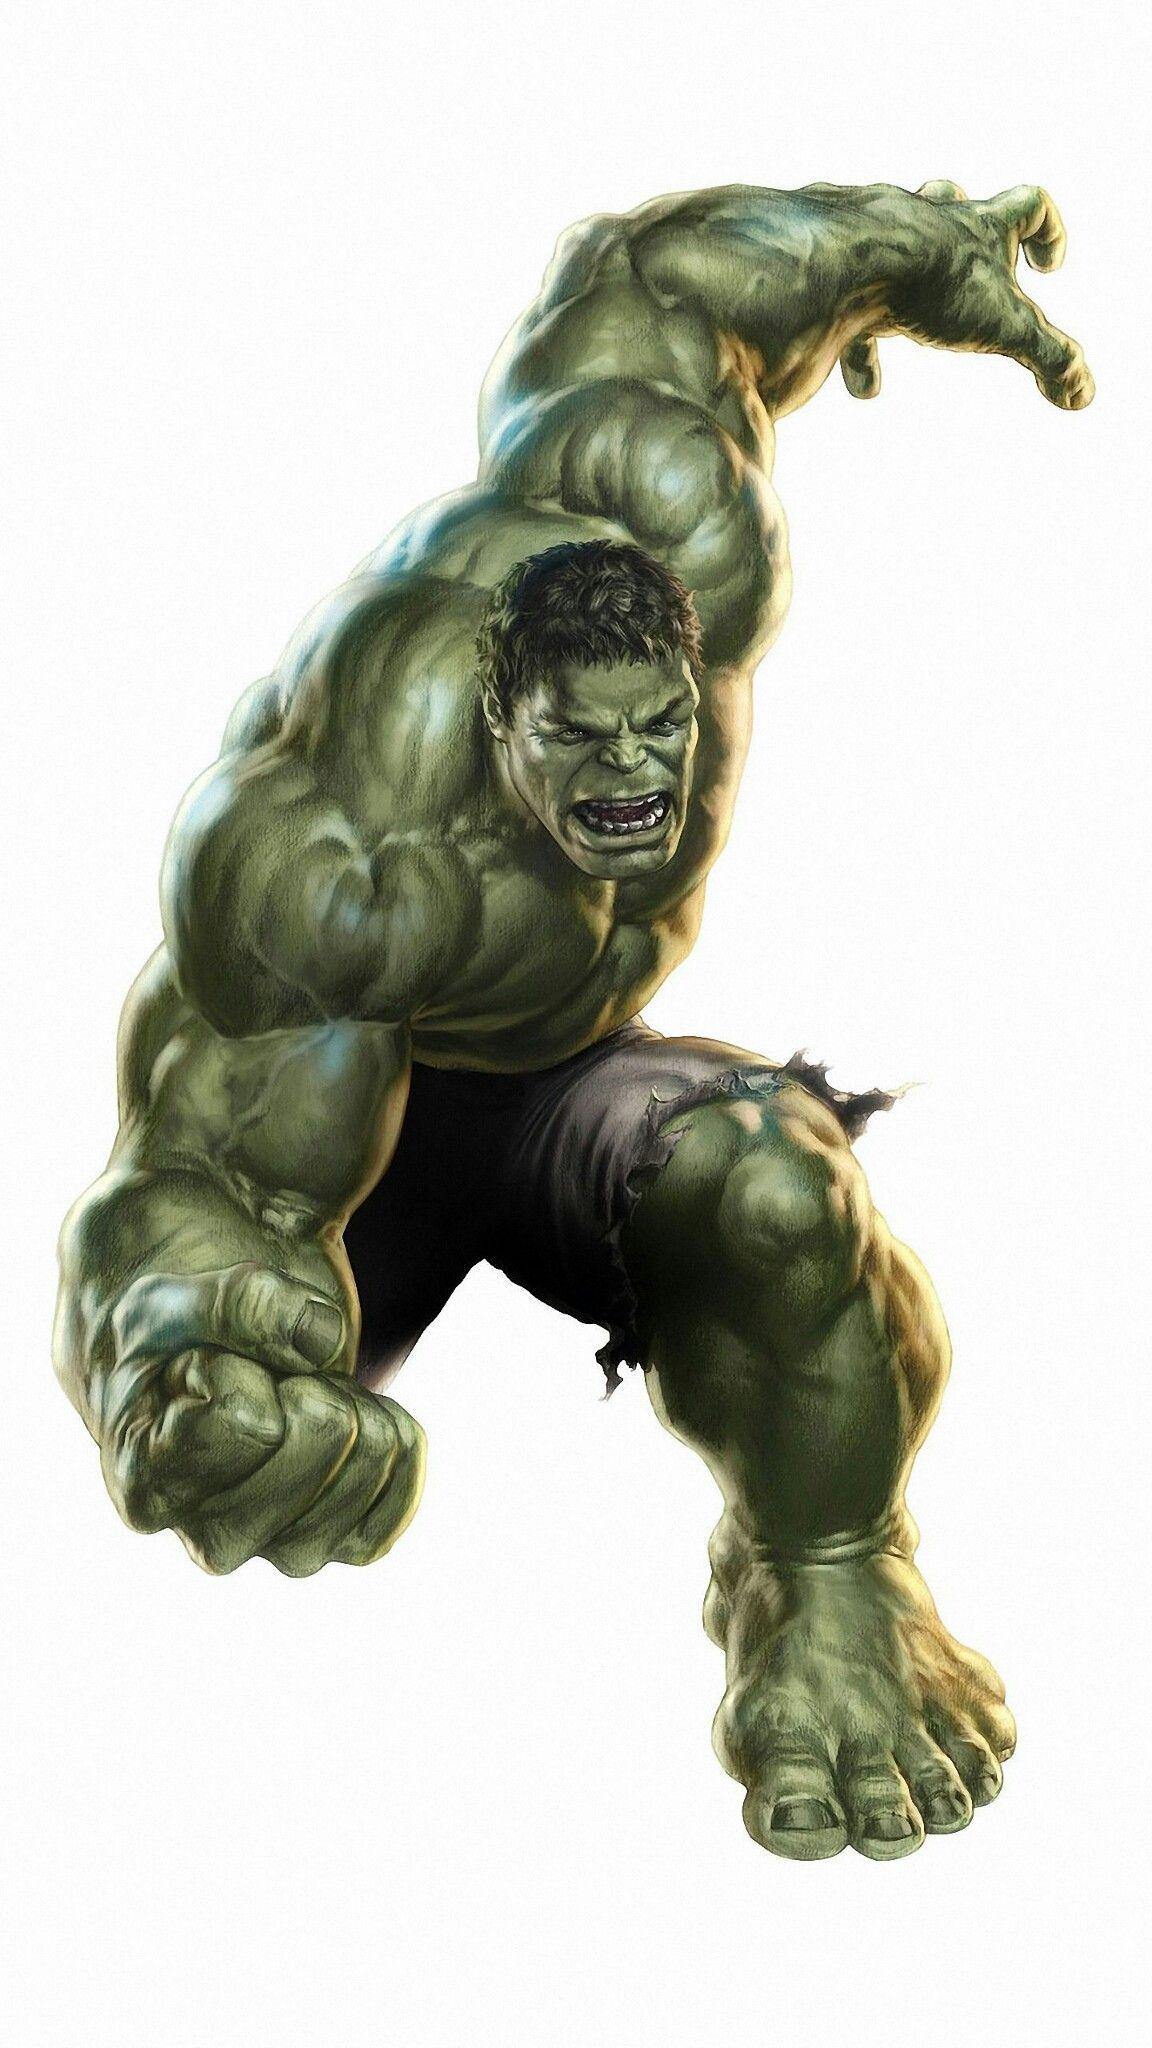 Hulk Alias Bruce Banner Favorite Marvel Characters Mobile